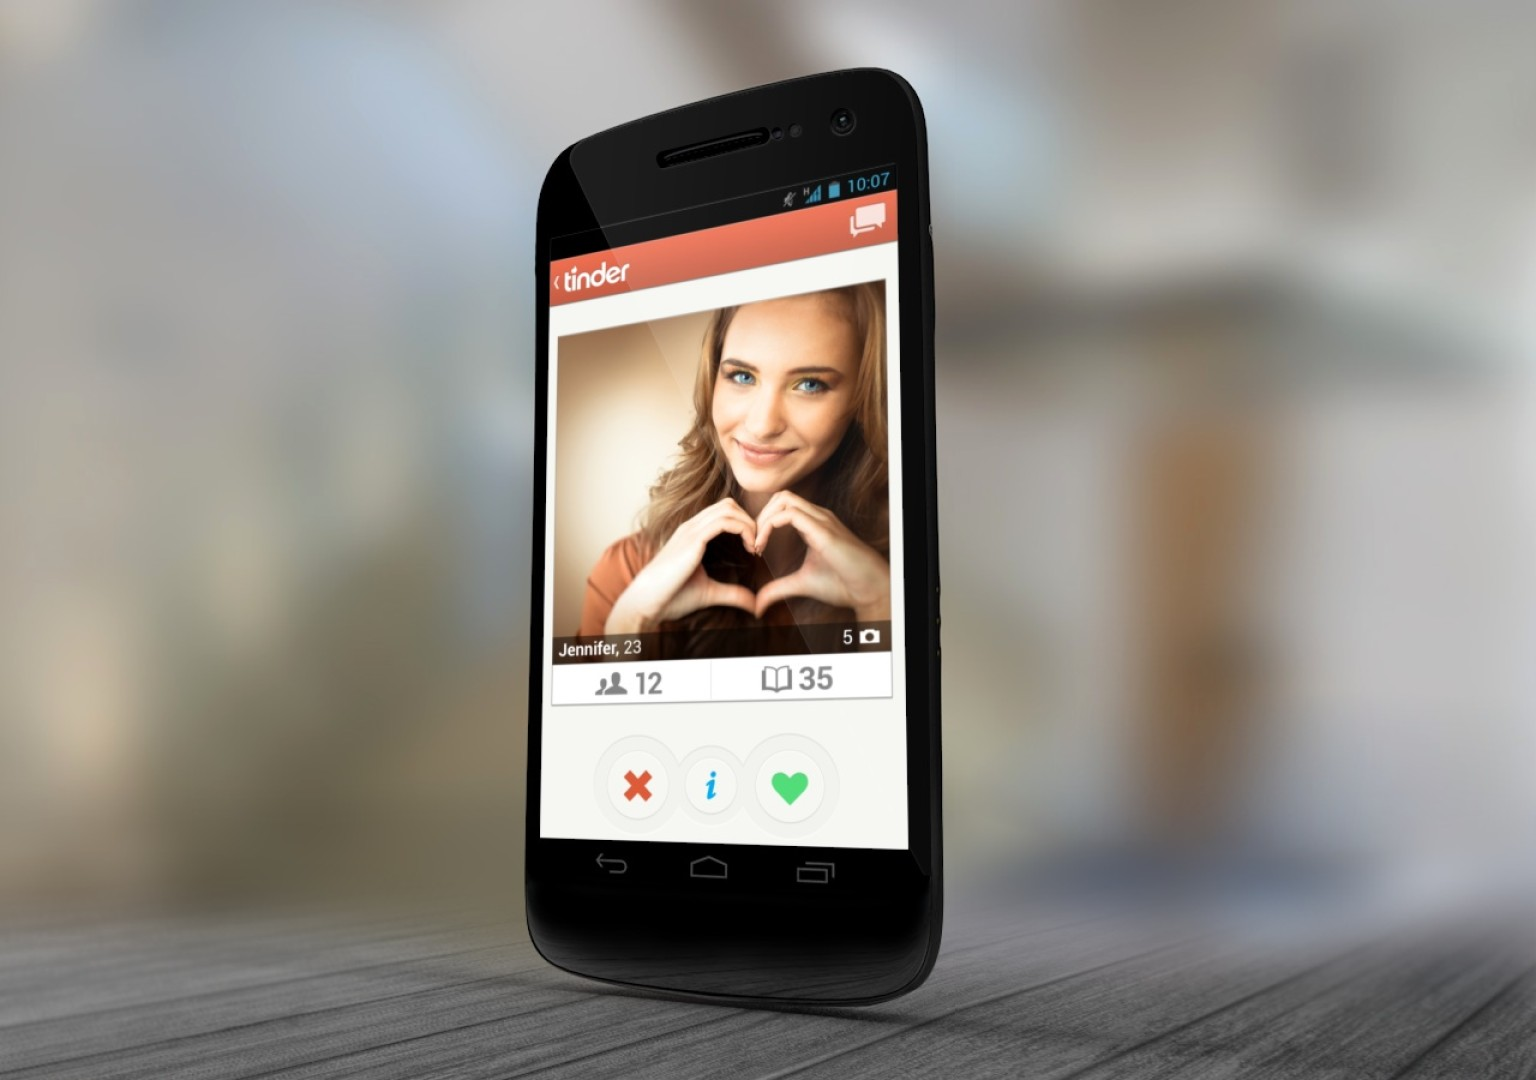 Приложение Tinder на смартфоне